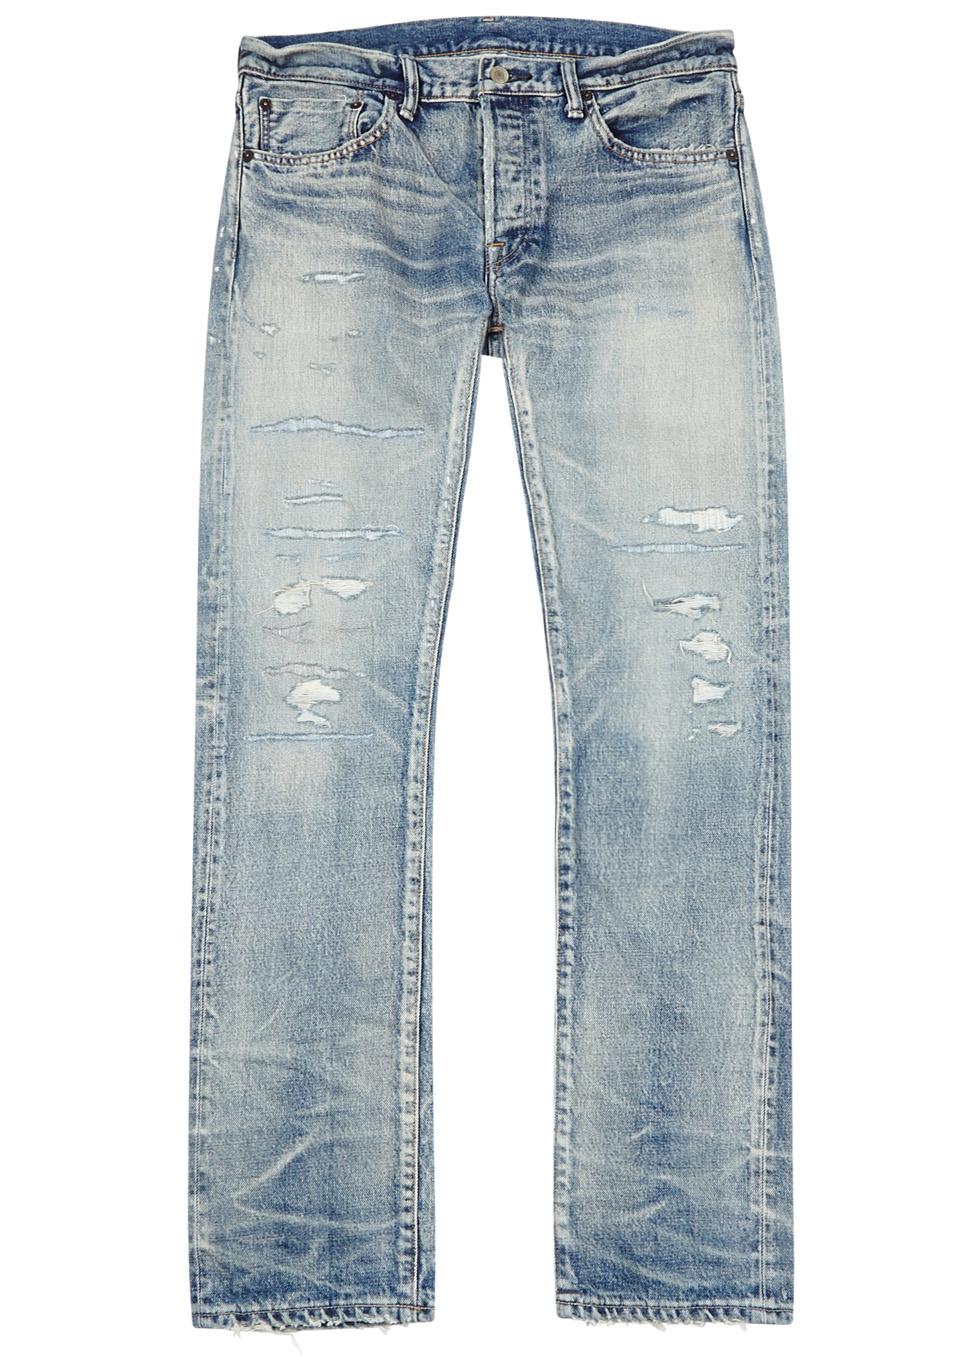 Fabric-Brand & Co. Emmett distressed selvedge jeans. USD 1,198.11 · Blue  distressed selvedge skinny jeans Blue distressed selvedge ...